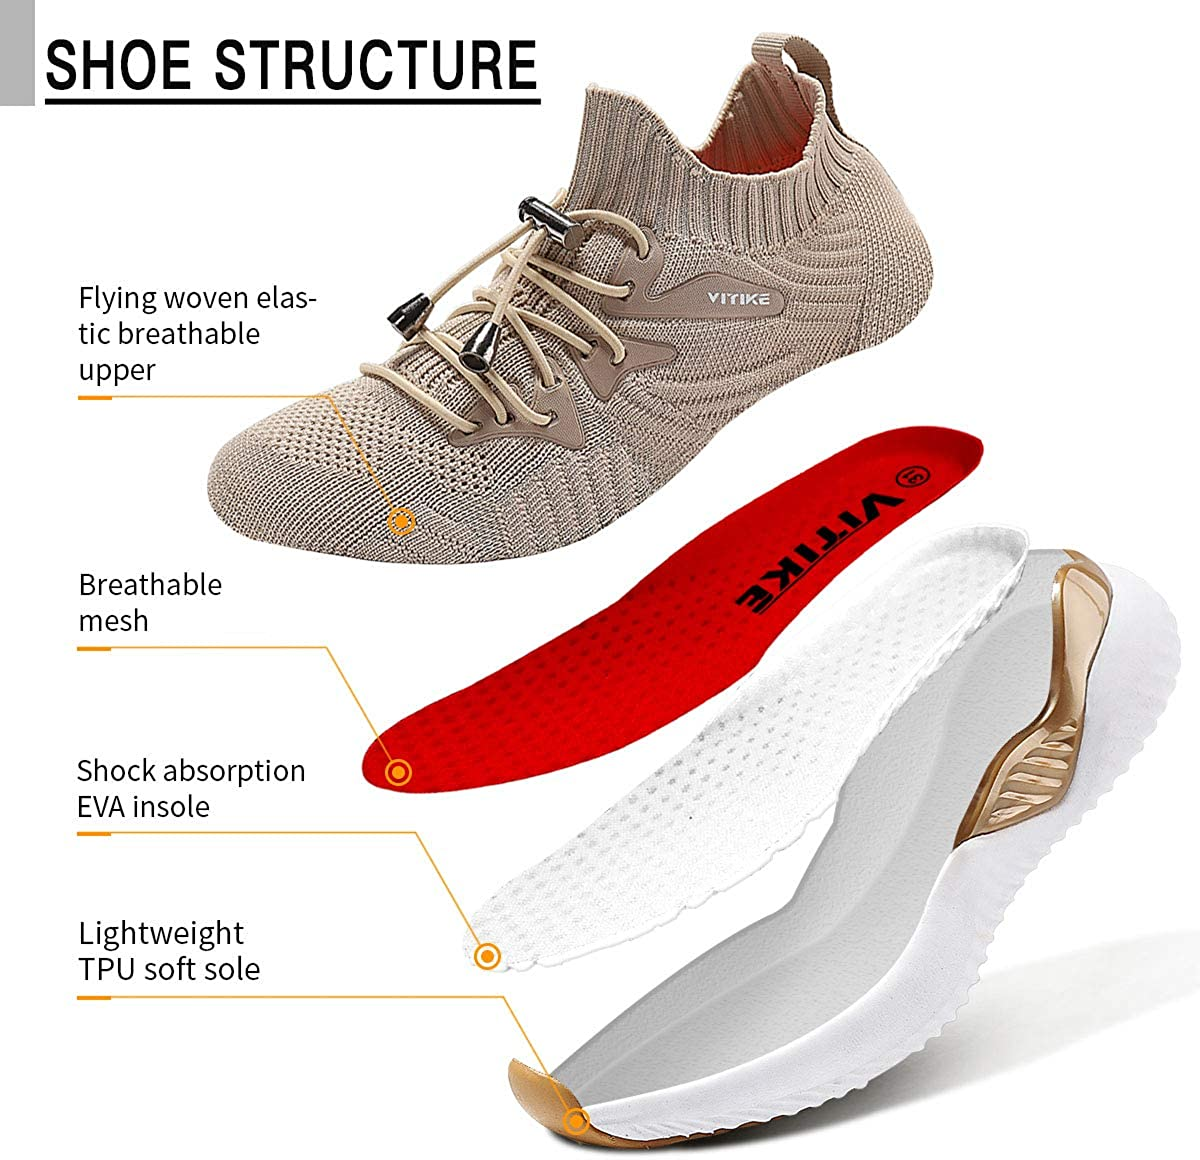 Garçon Fille Chaussures de Course Tennis Sneakers Femme Walking Shoes Baskets Mode Mixte Enfant Running Sneakers 11 Kaki